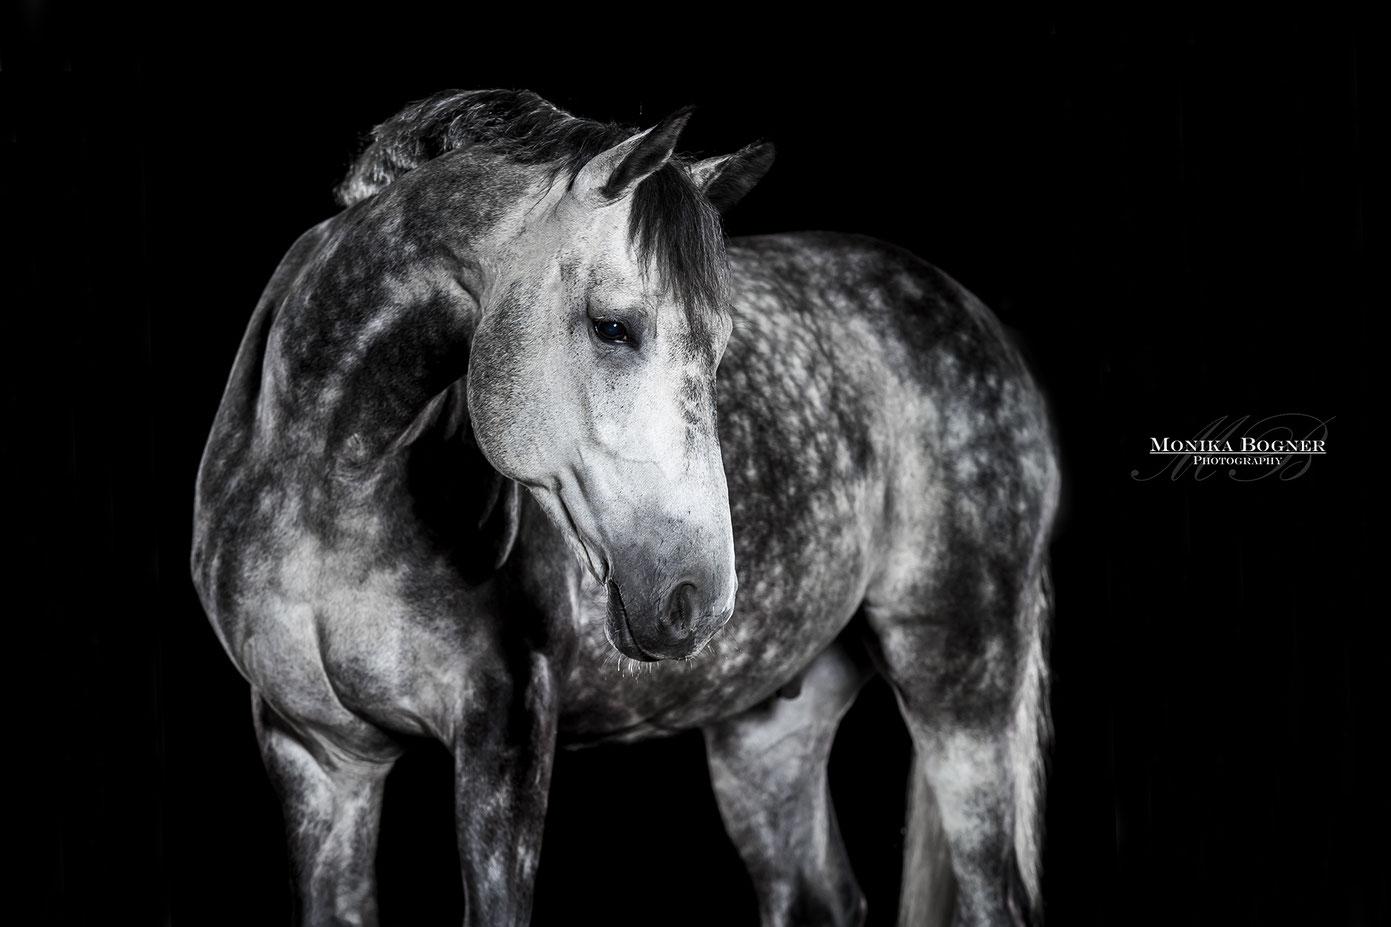 Geliebte Pferde im Studio - Monika Bogner Photography - Pferdefotografie @BH_05